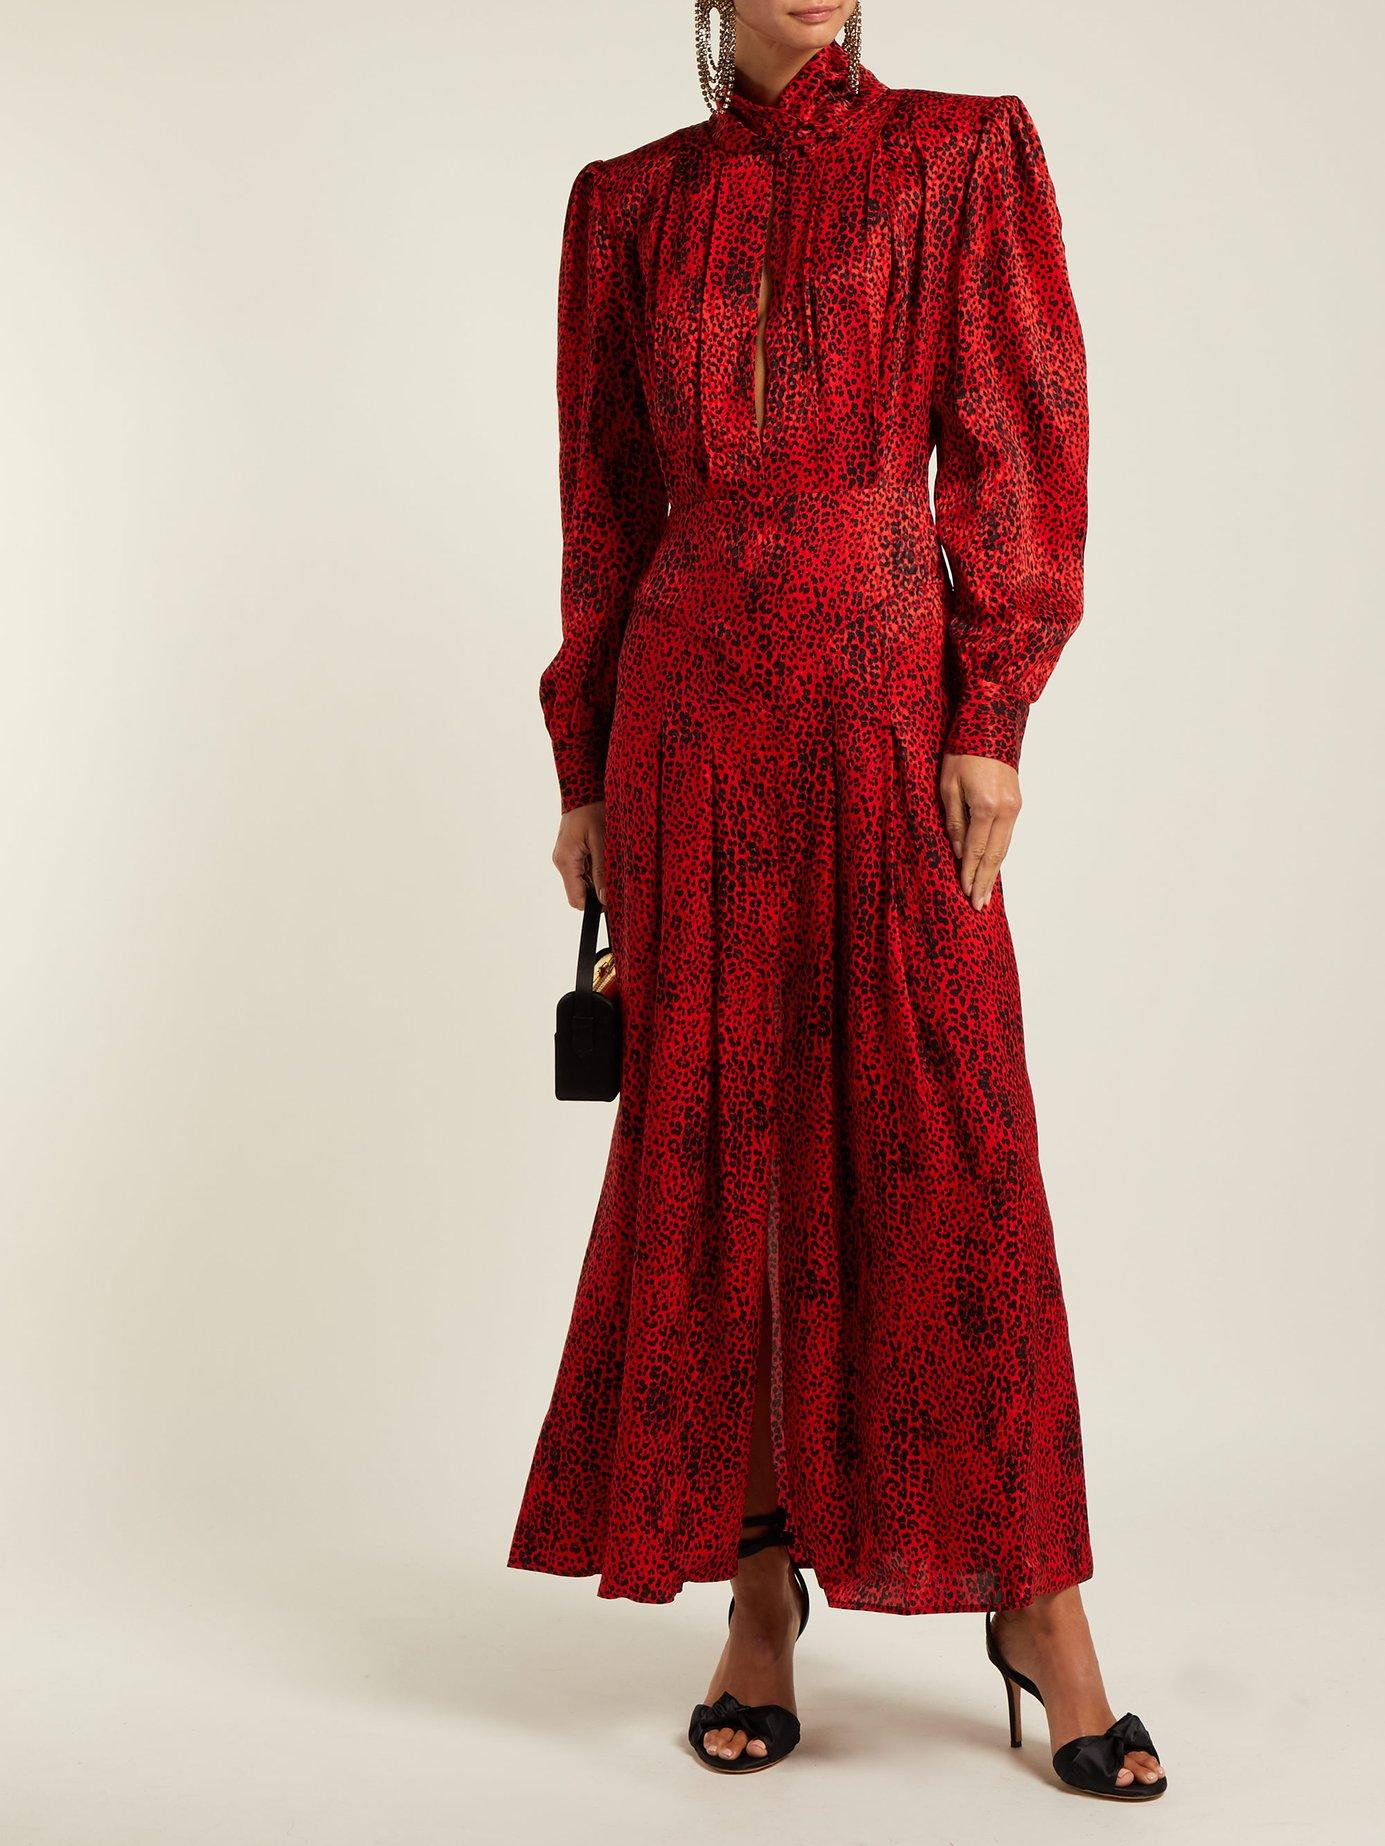 Leopard-jacquard silk dress by Alessandra Rich